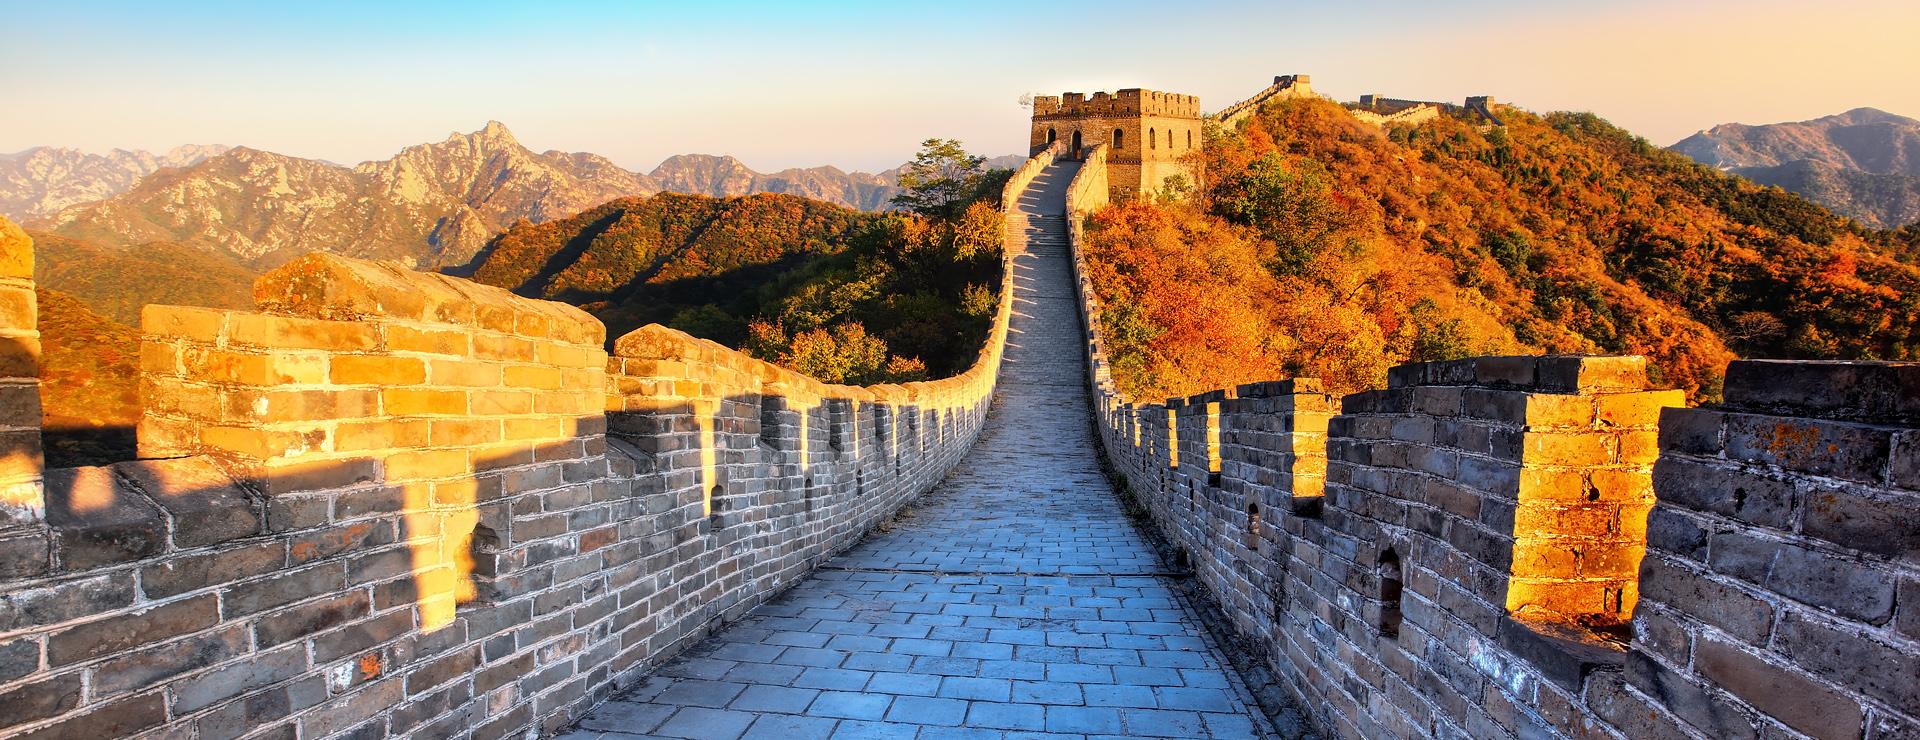 Peking – Kinesiska muren